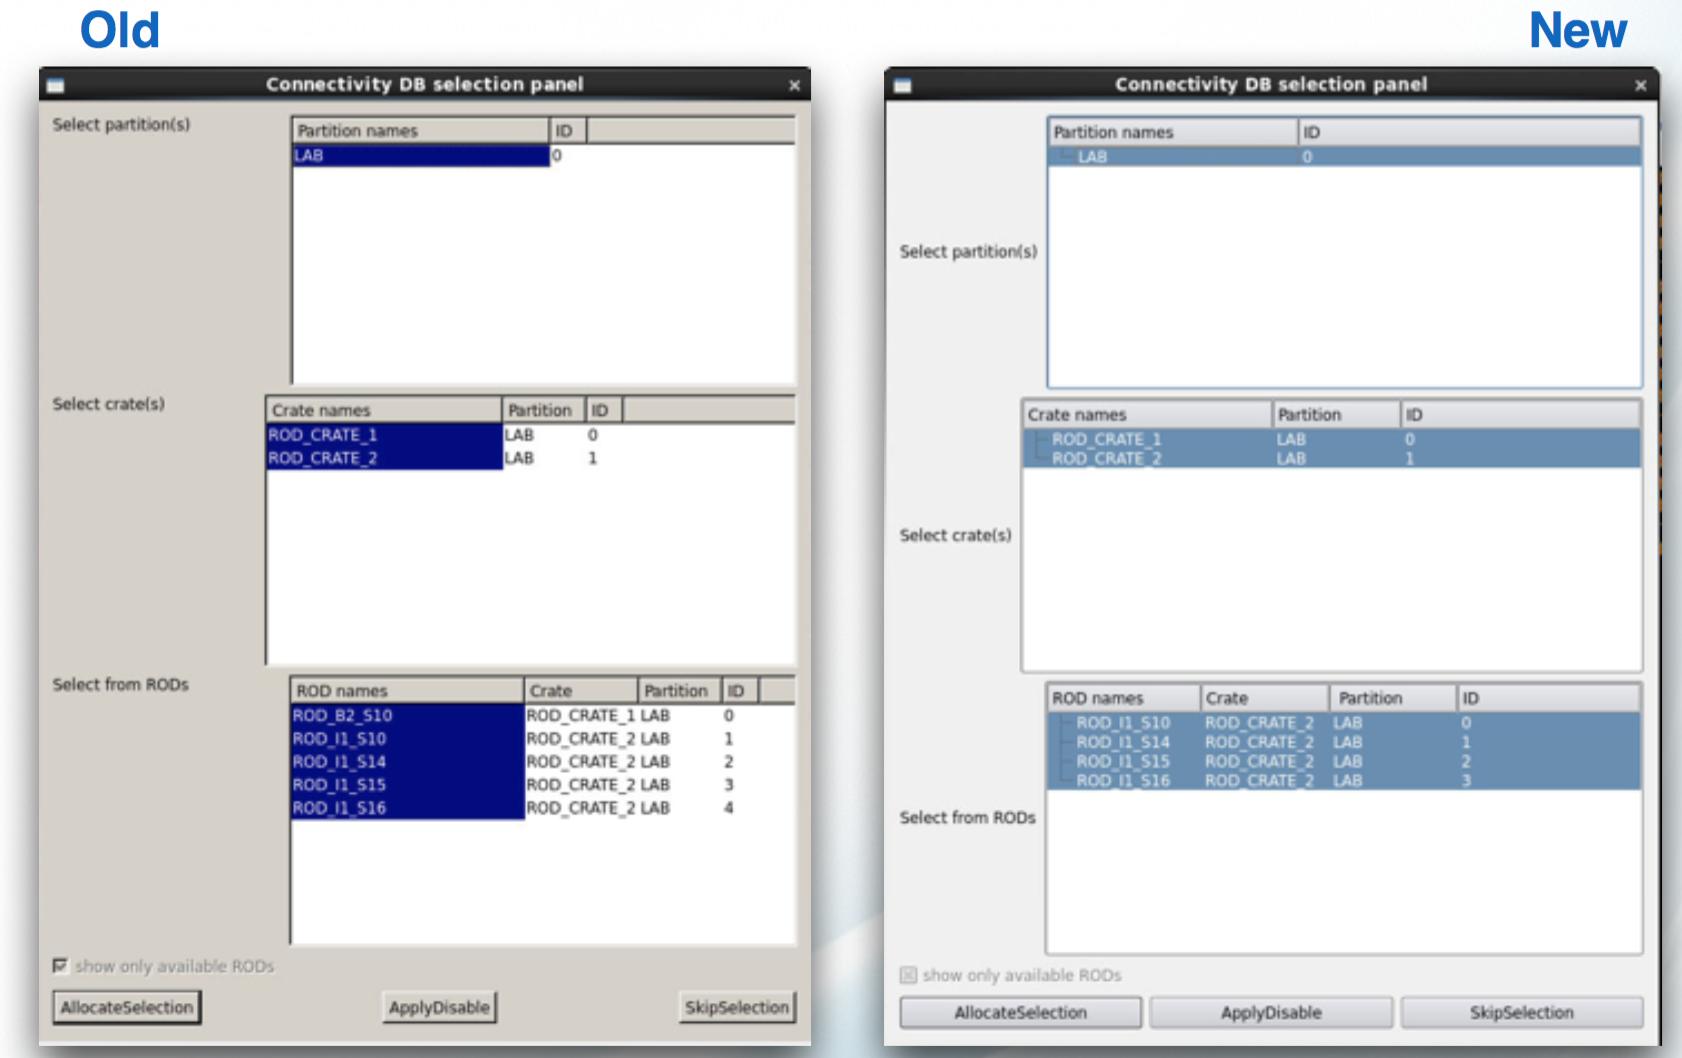 CalibrationConsole < Main < TWiki